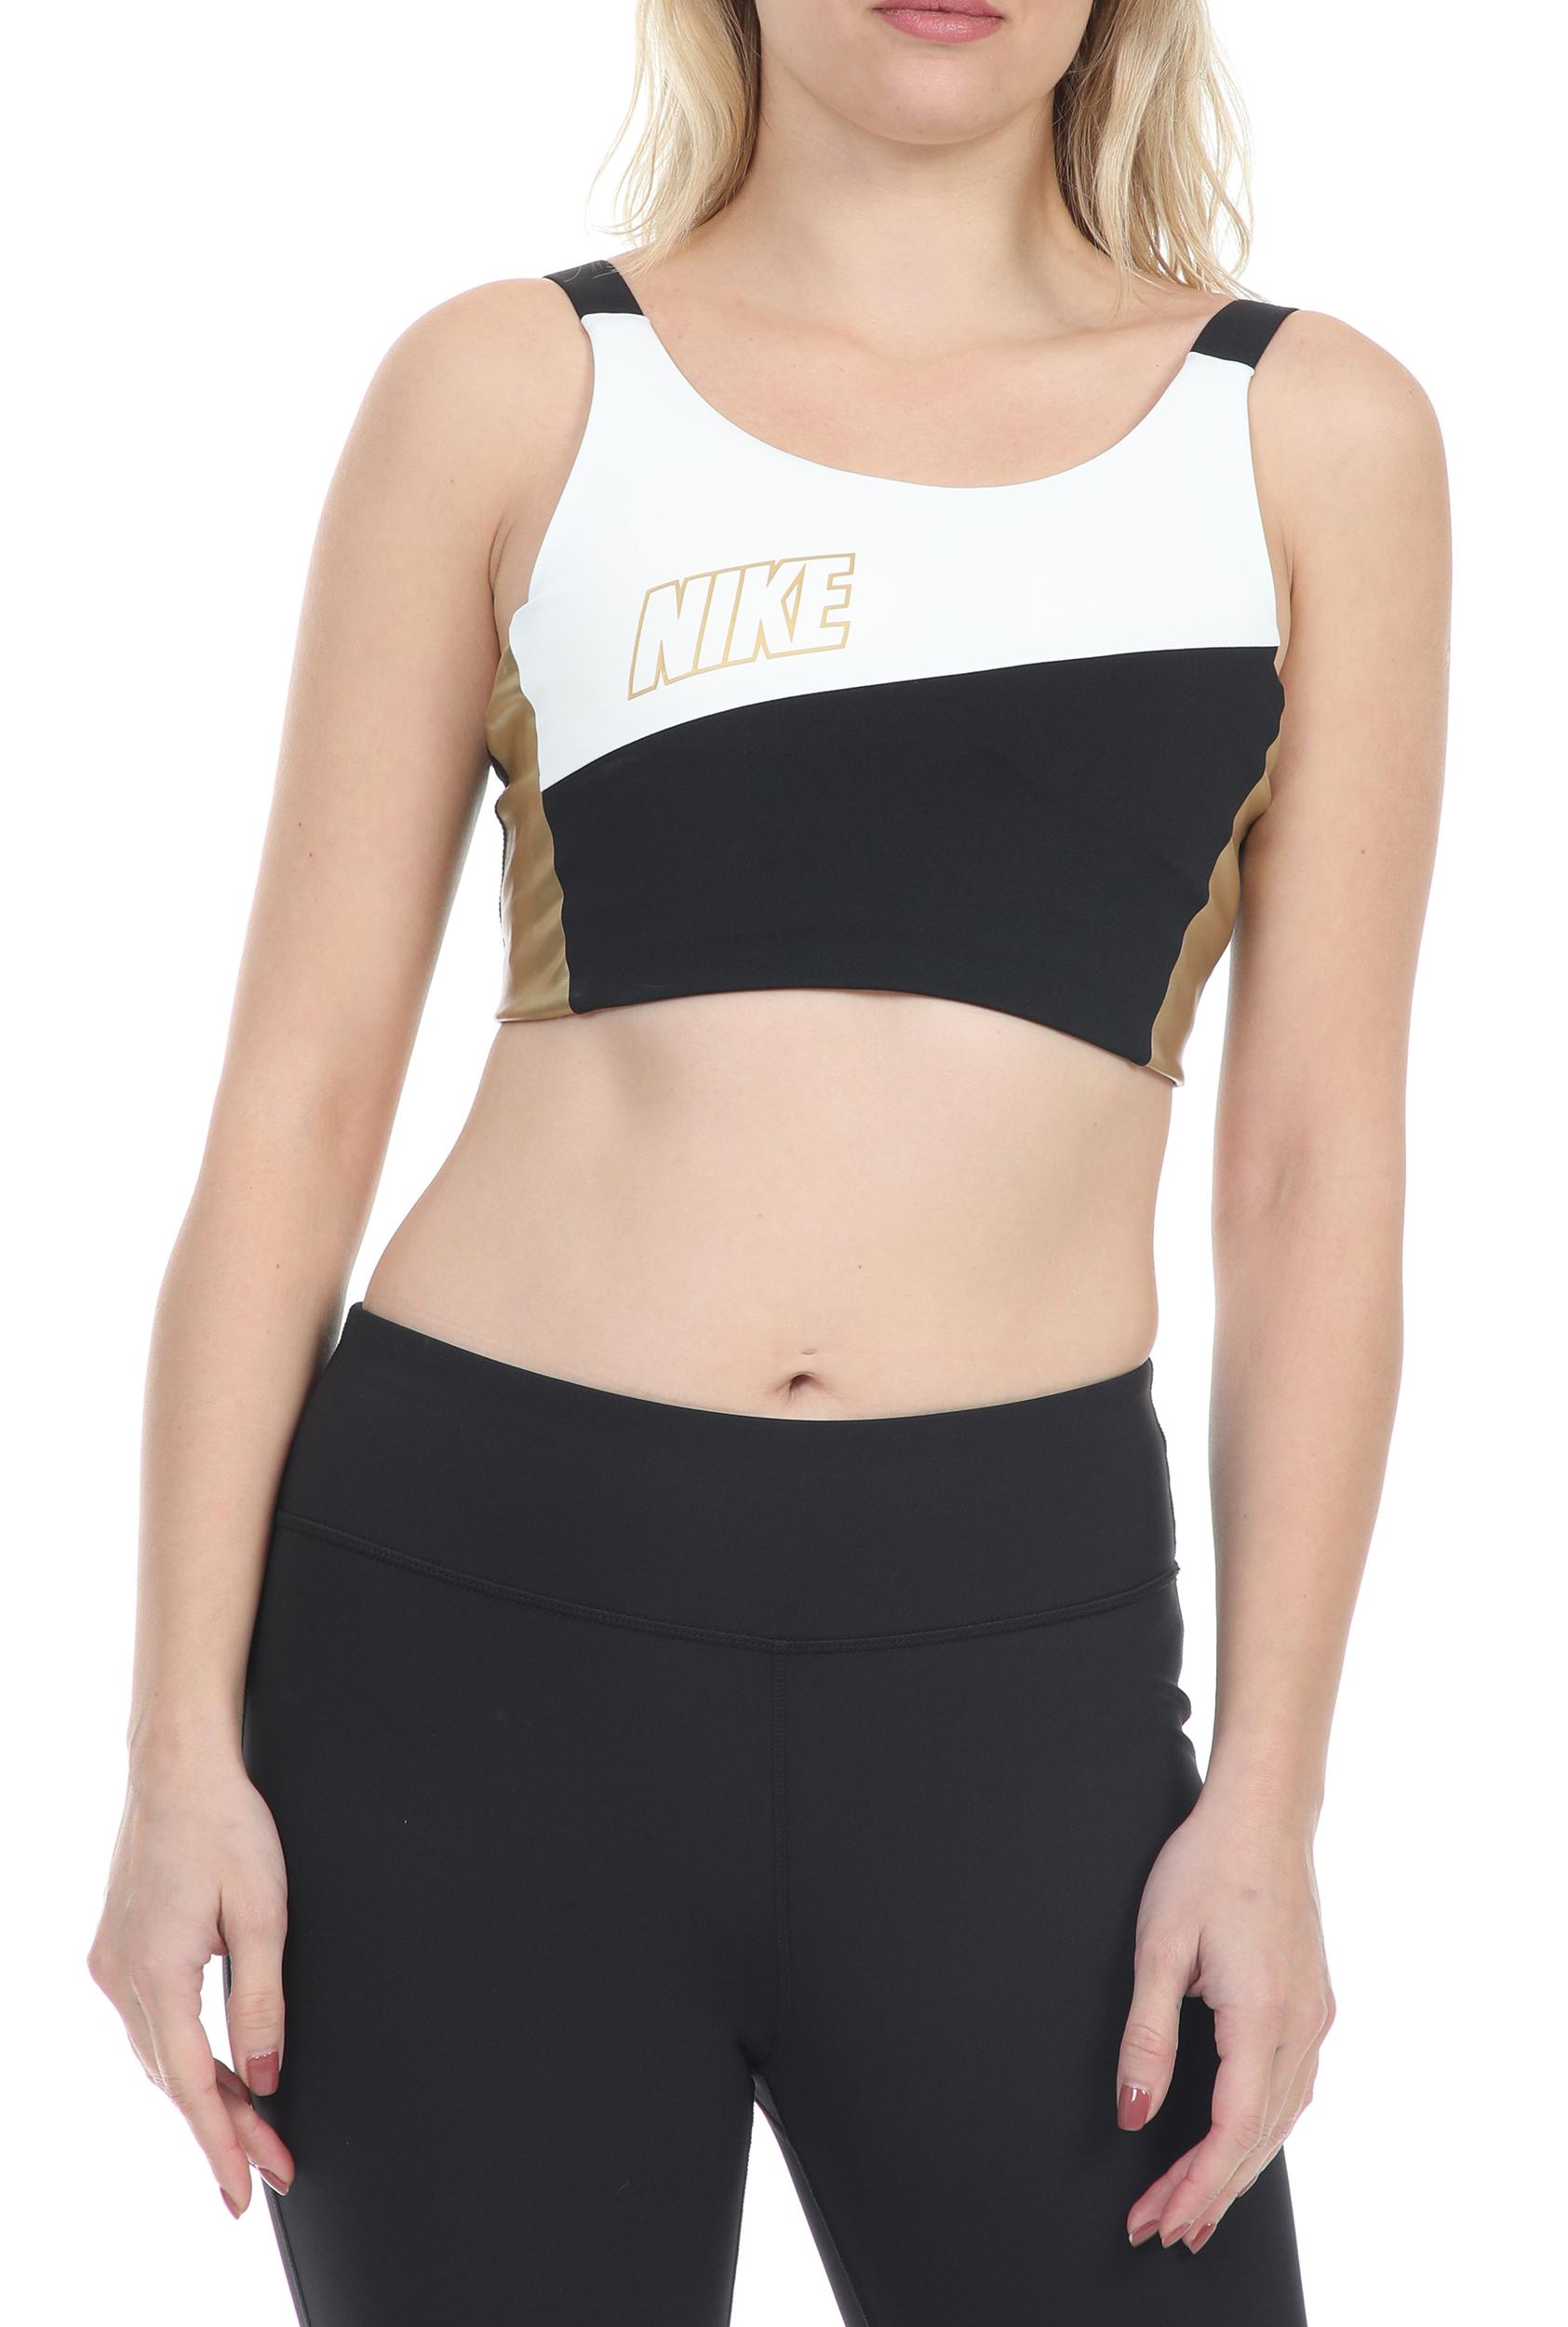 NIKE - Γυναικείο μπουστάκι NIKE SWOOSH MTLC LOGO BRA PAD λευκό-μαύρο